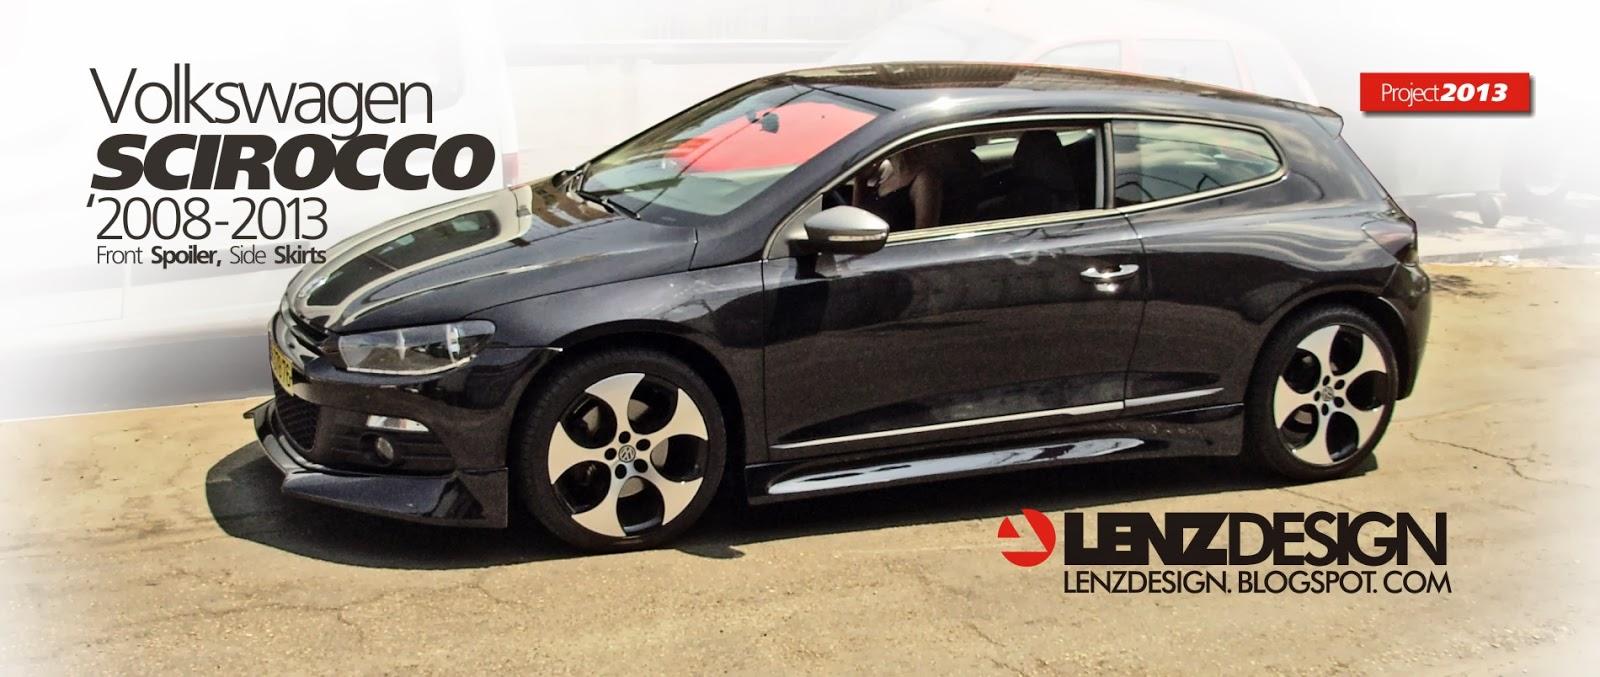 VW Scirocco Tuning - Body Kit Lenzdesign Performance